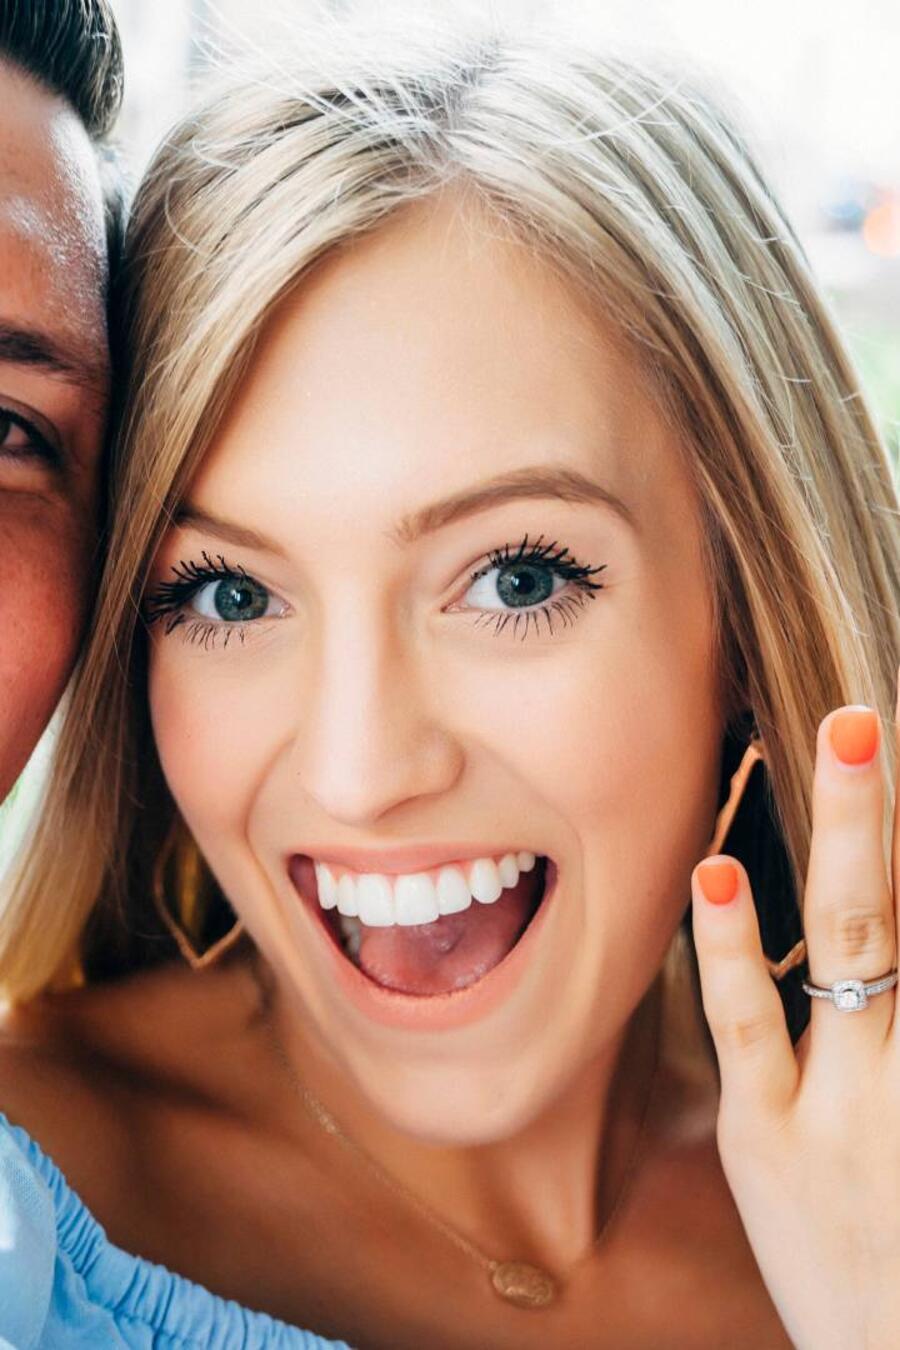 Mujer mostrando su anillo de compromiso